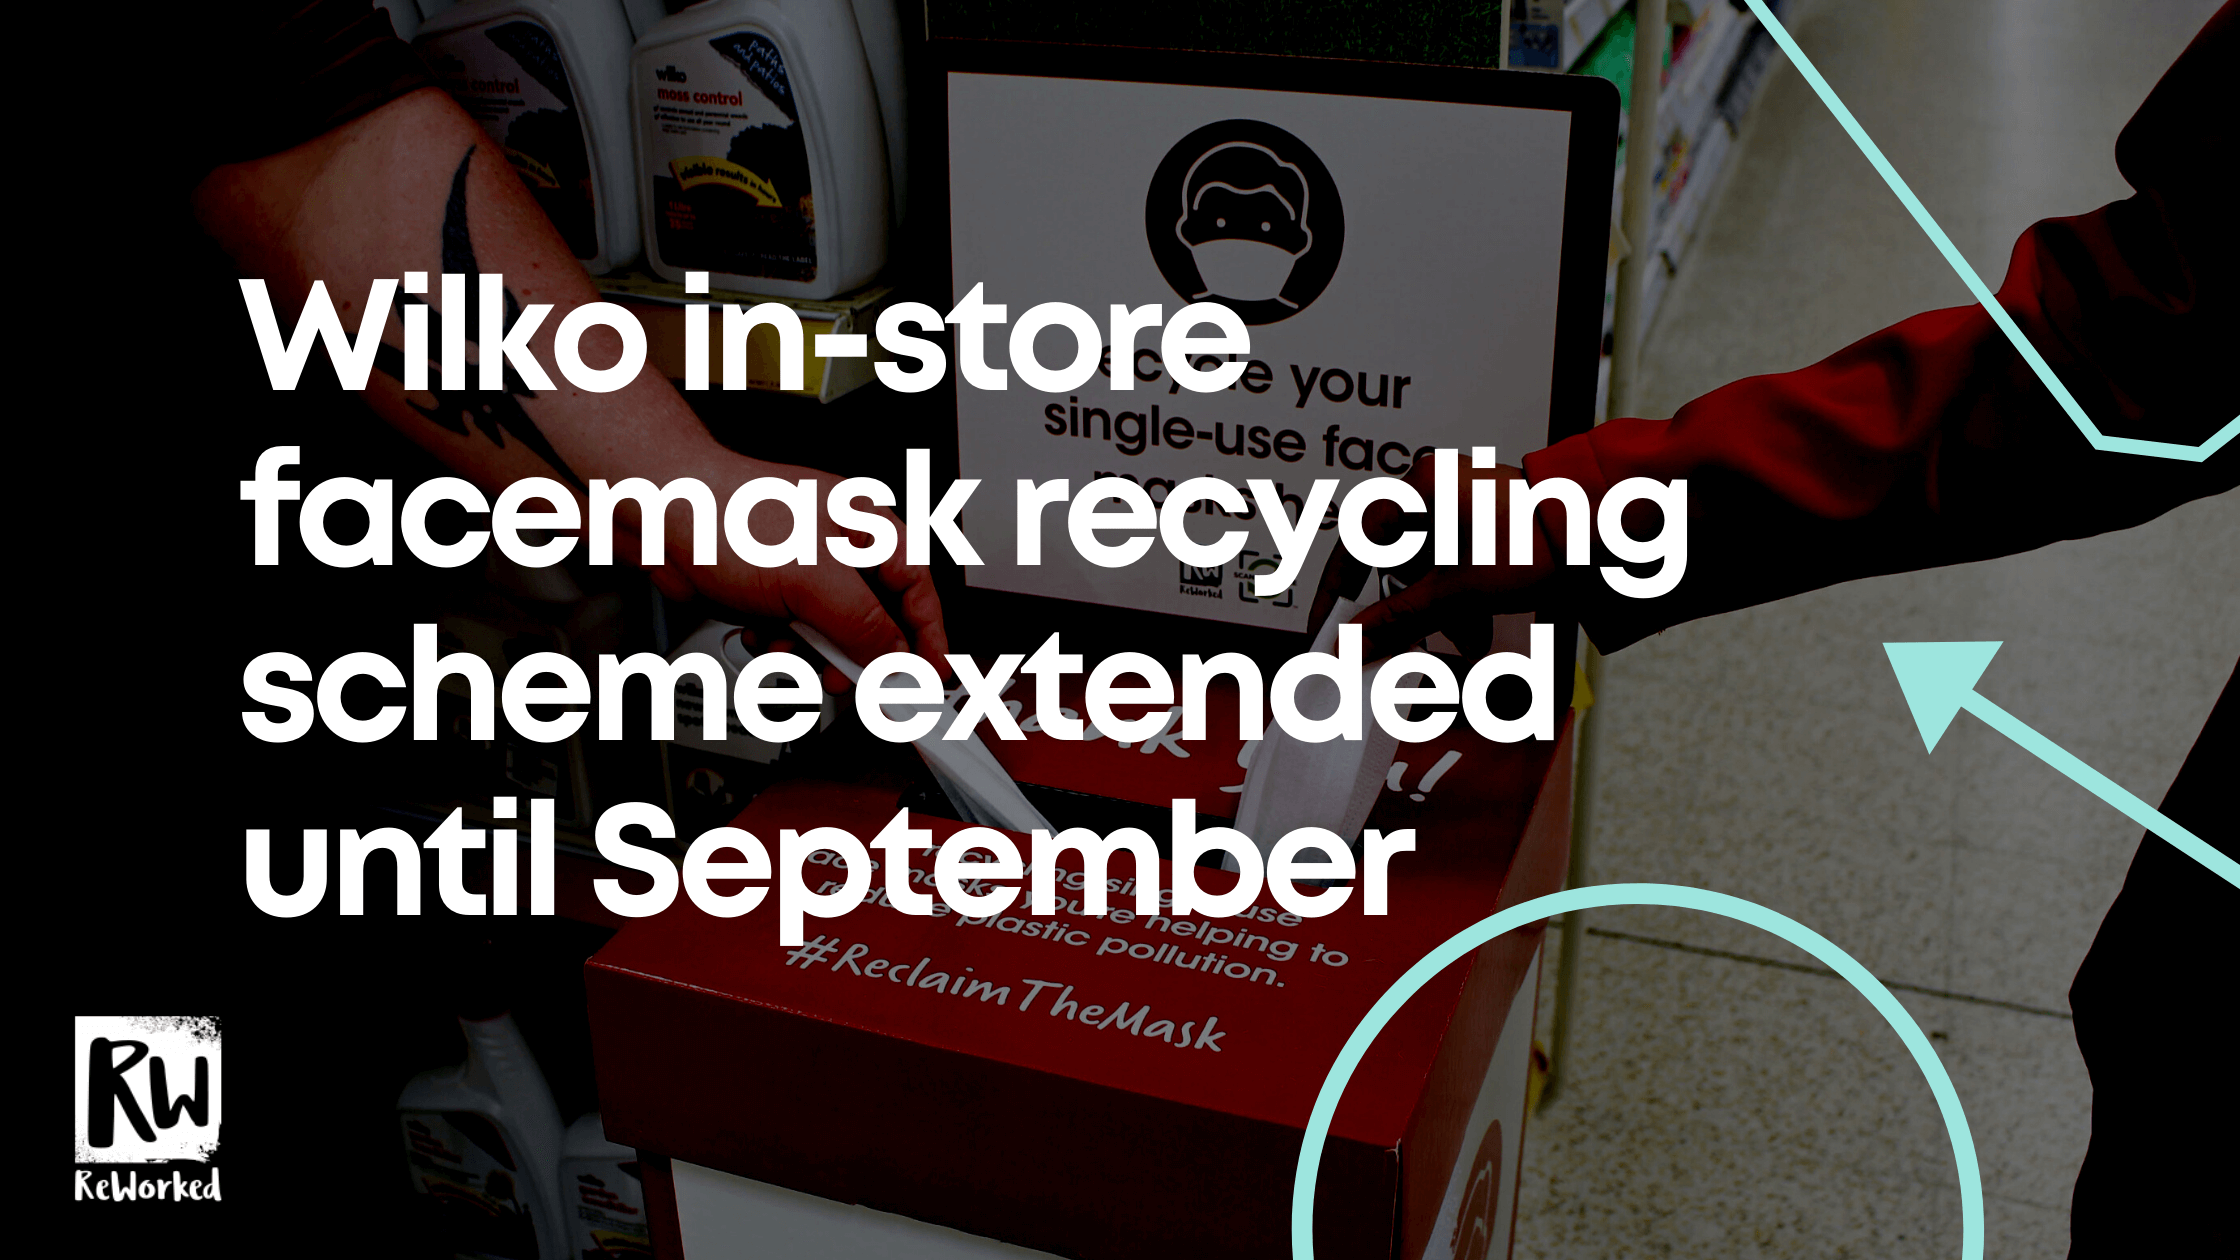 Wilko #reclaimthemask facemask recycling scheme